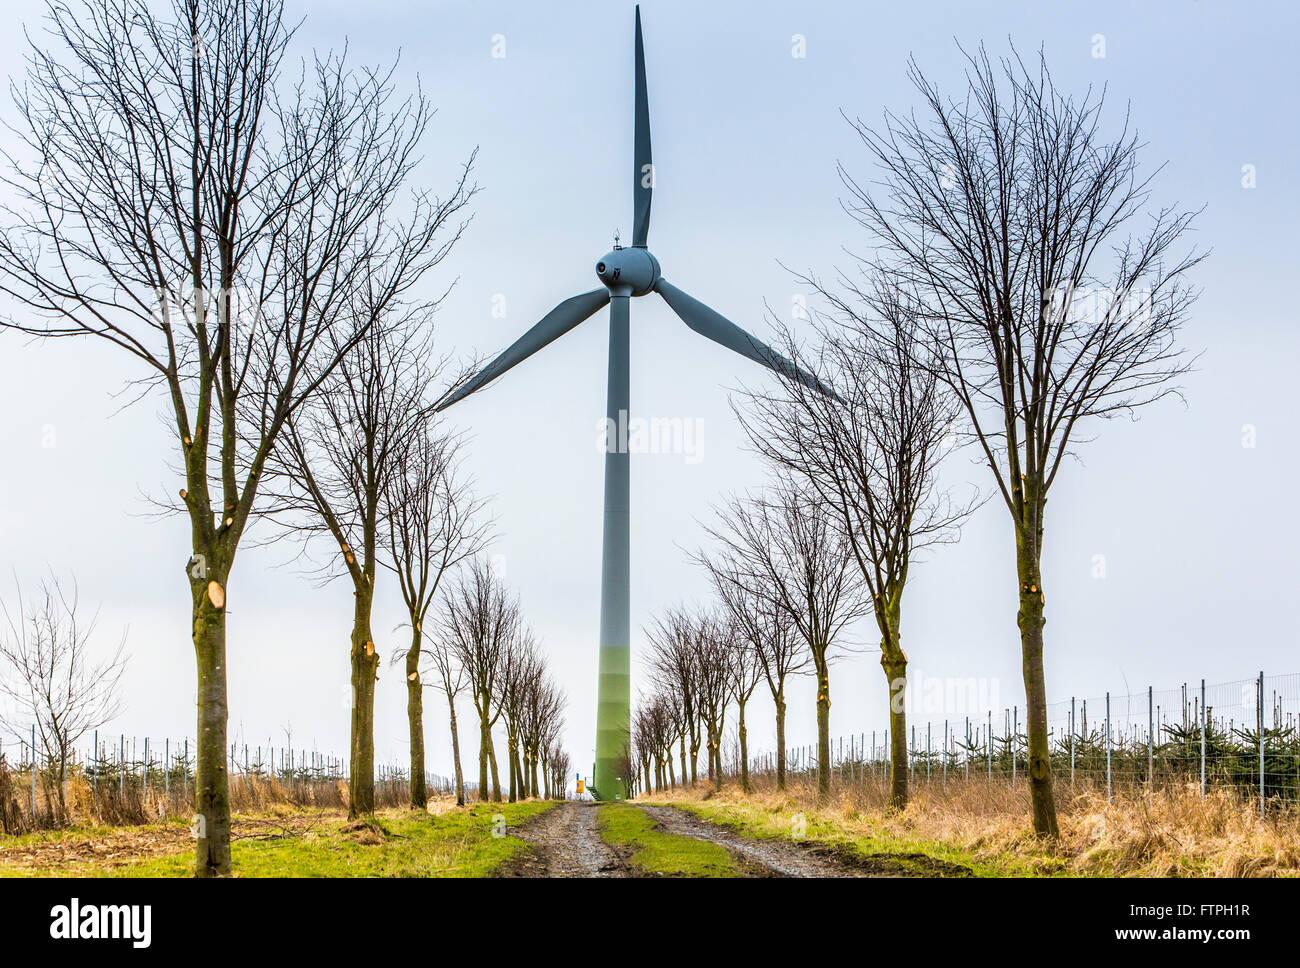 Wind energy, wind turbine in landscape, in Ense, Germany, trees, alley, - Stock Image